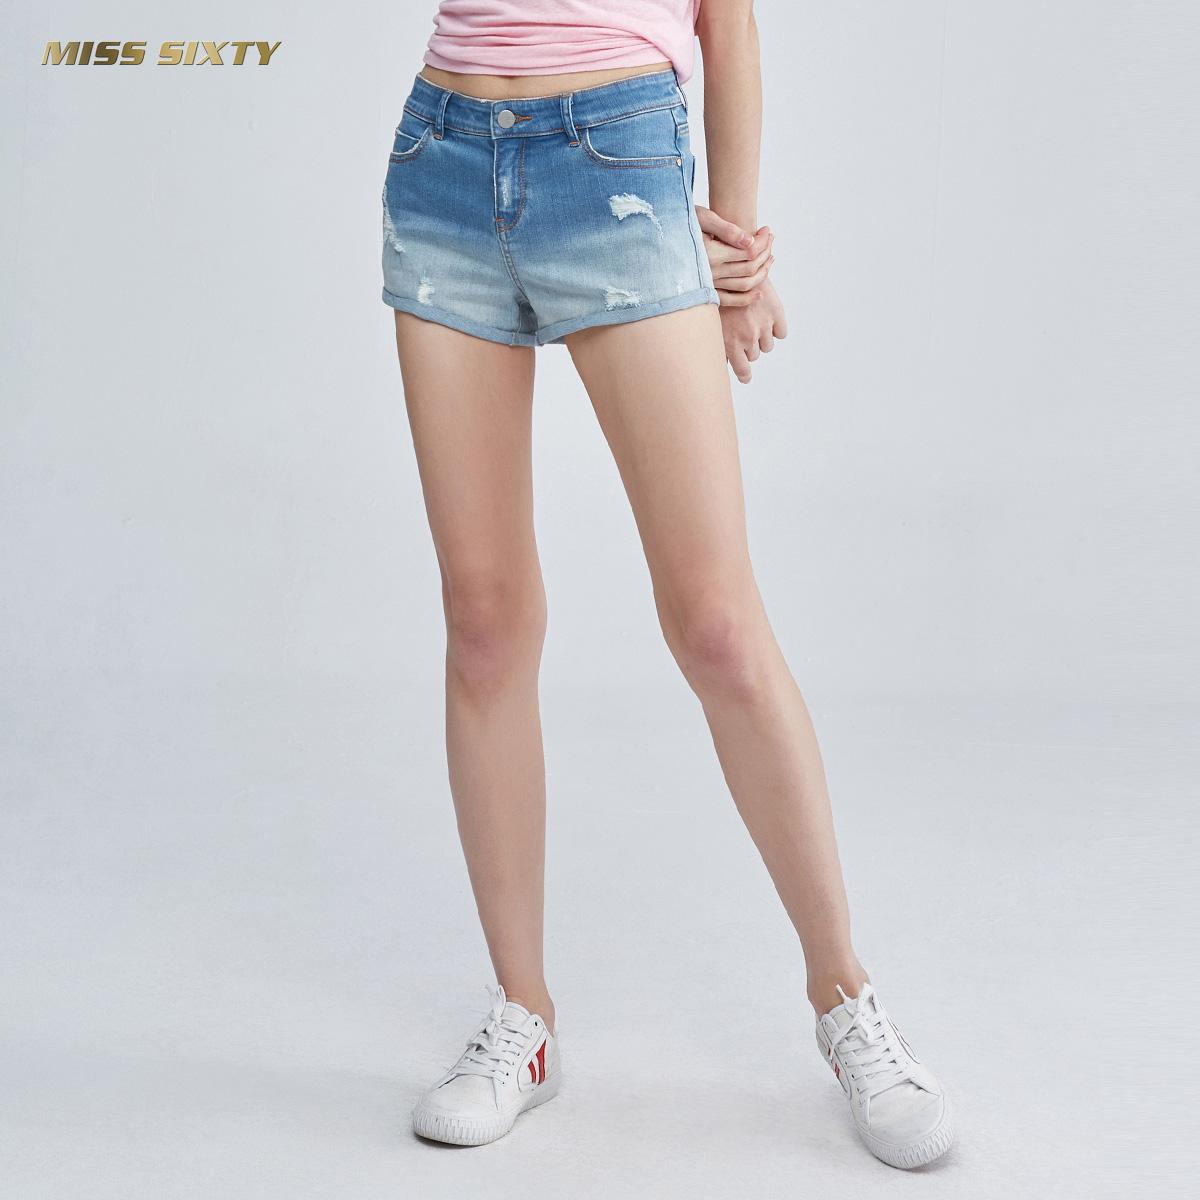 A Miss Sixty2018新款夏季破洞熱褲闊腿牛仔短褲女682JJ2321000